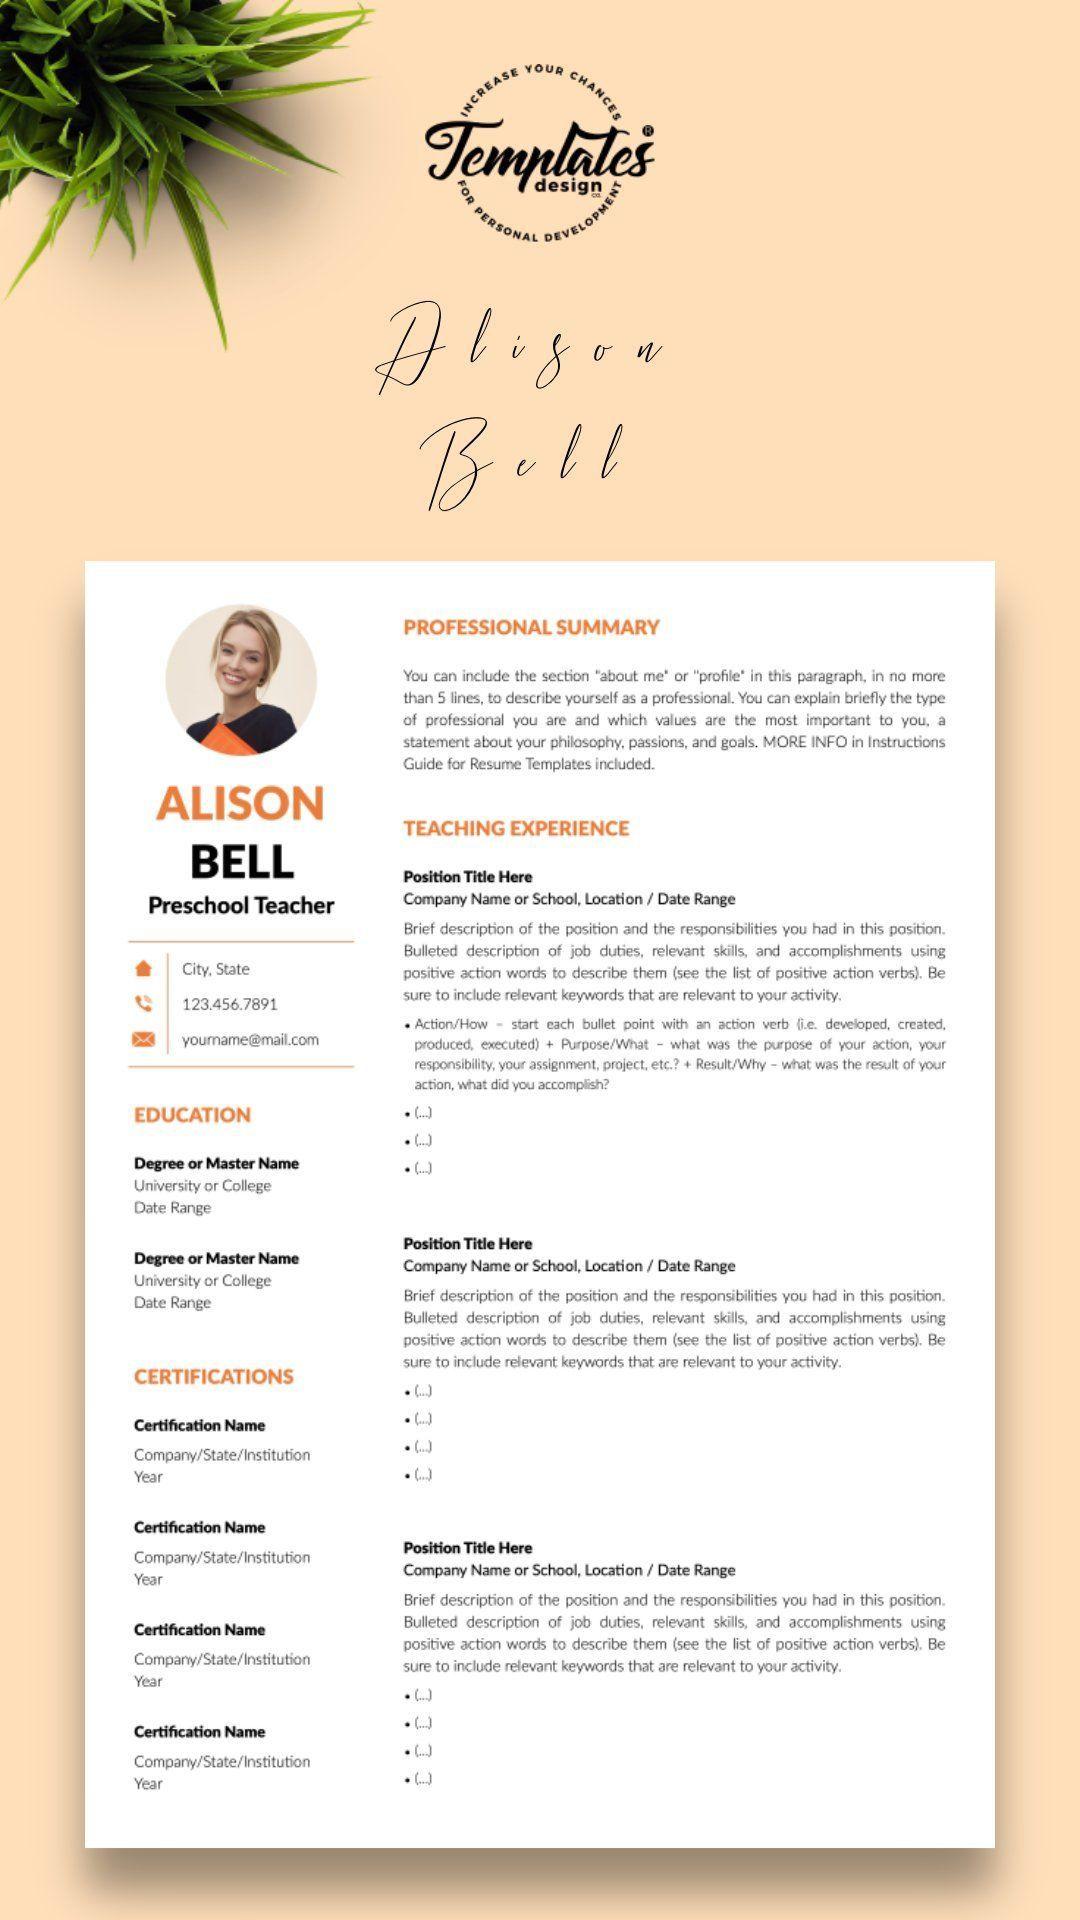 004 Frightening Teacher Resume Template Microsoft Word 2007 High Definition Full